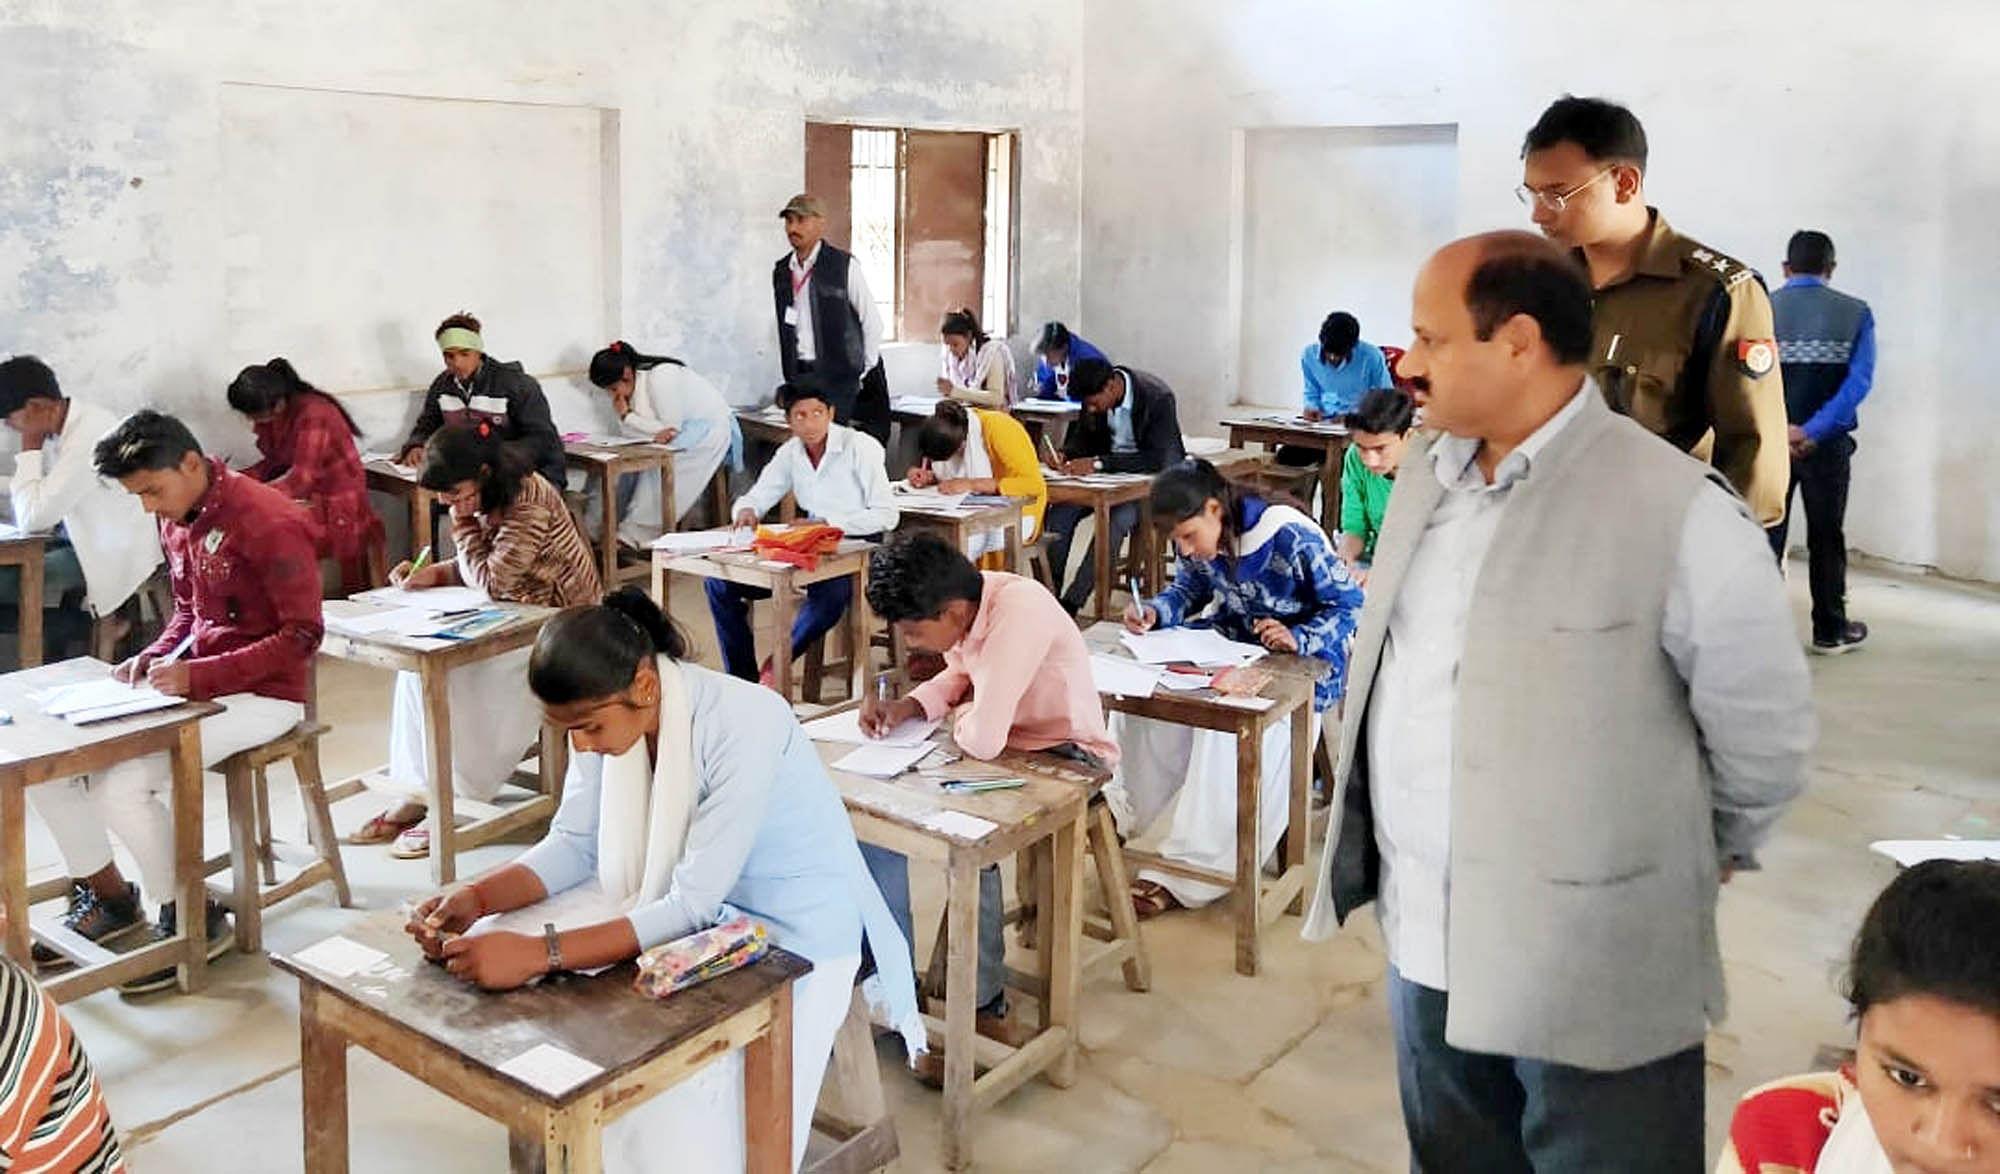 परीक्षा केंद्र का निरीक्षण करते डीएम ज्ञानेश्वर त्रिपाठी व एसपी श्लोक कुमार।